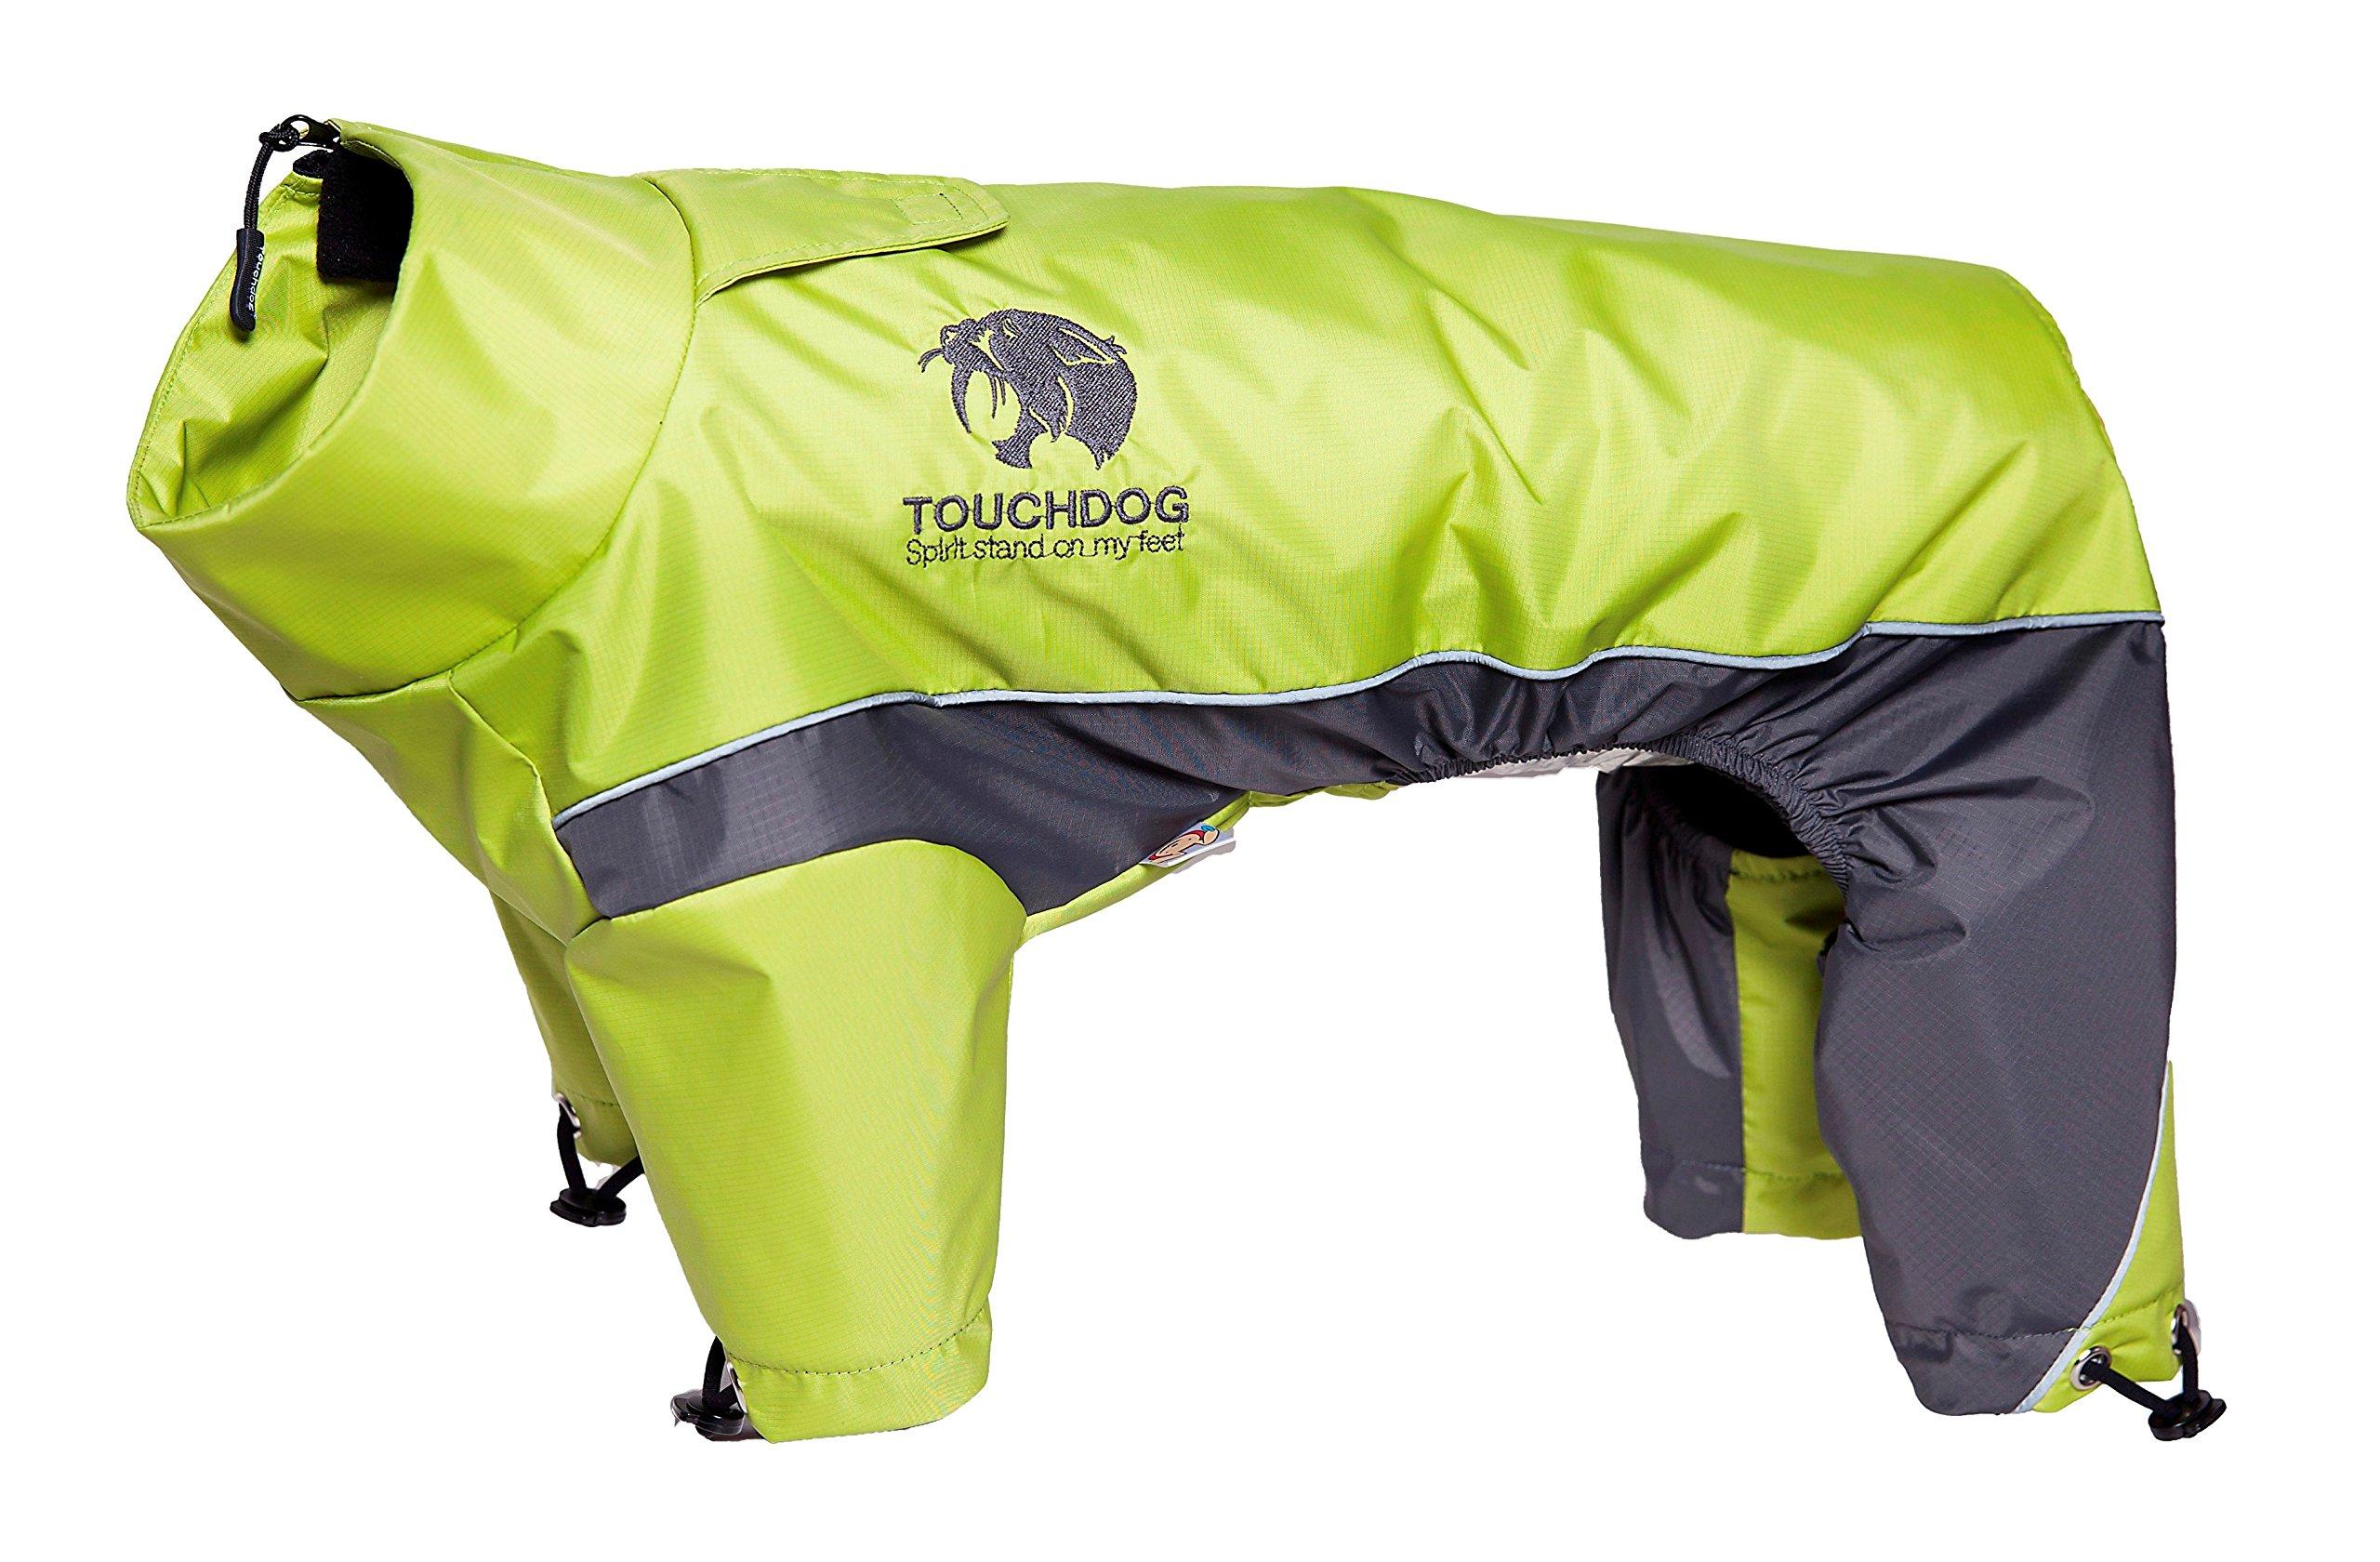 TOUCHDOG 'Quantum-Ice' Full Body Bodied Adjustable and 3M Reflective Pet Dog Coat Jacket w/ Blackshark Technology, Medium, Light Yellow, Grey